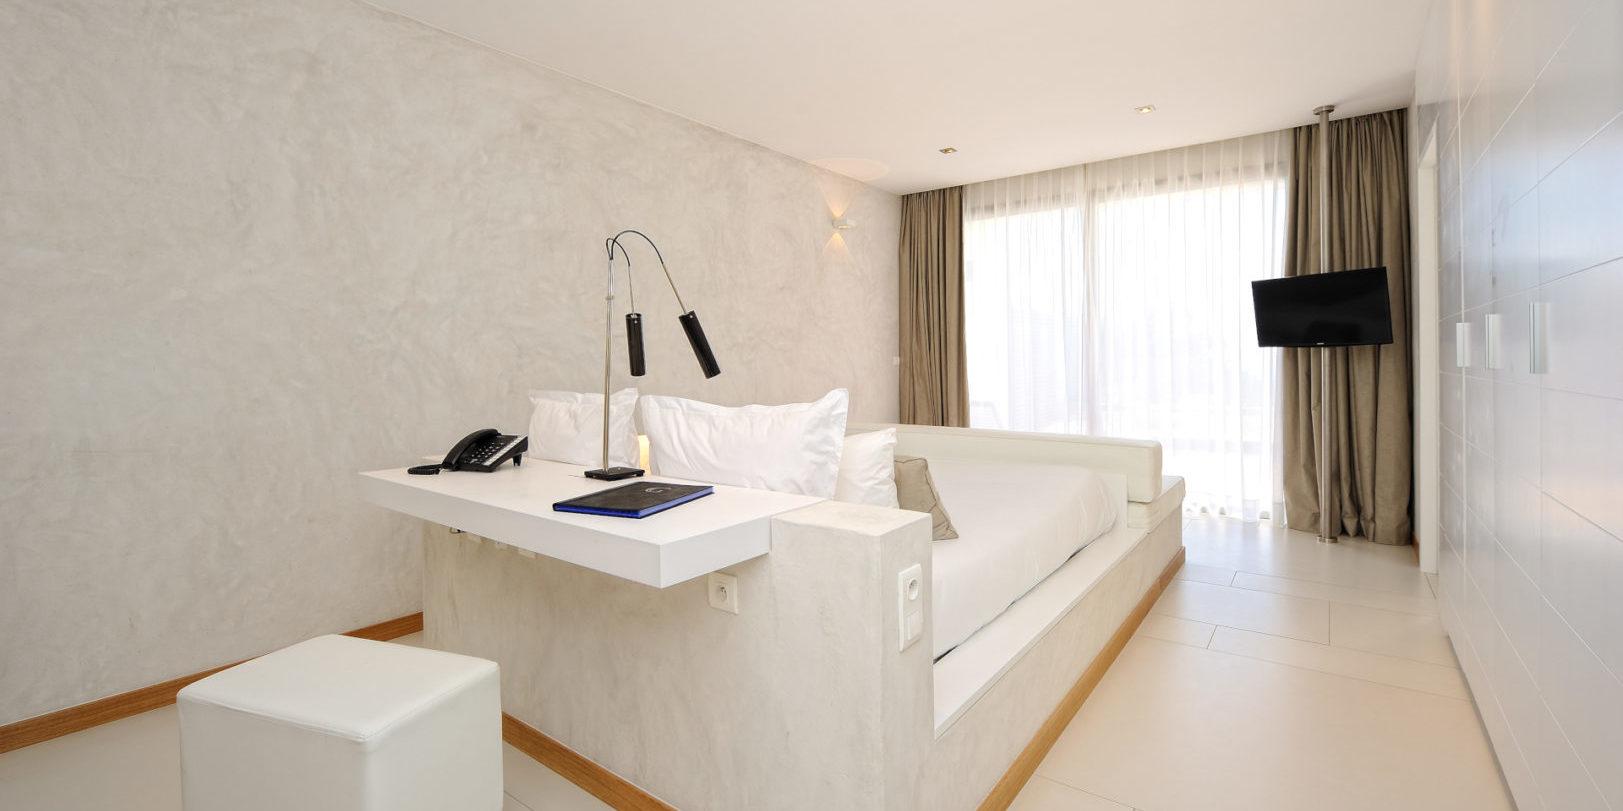 Hotel Cala di Greco Bonifacio Corsica Zuid-Corsica Frankrijk suite wit oranje stucwerk witte-muur